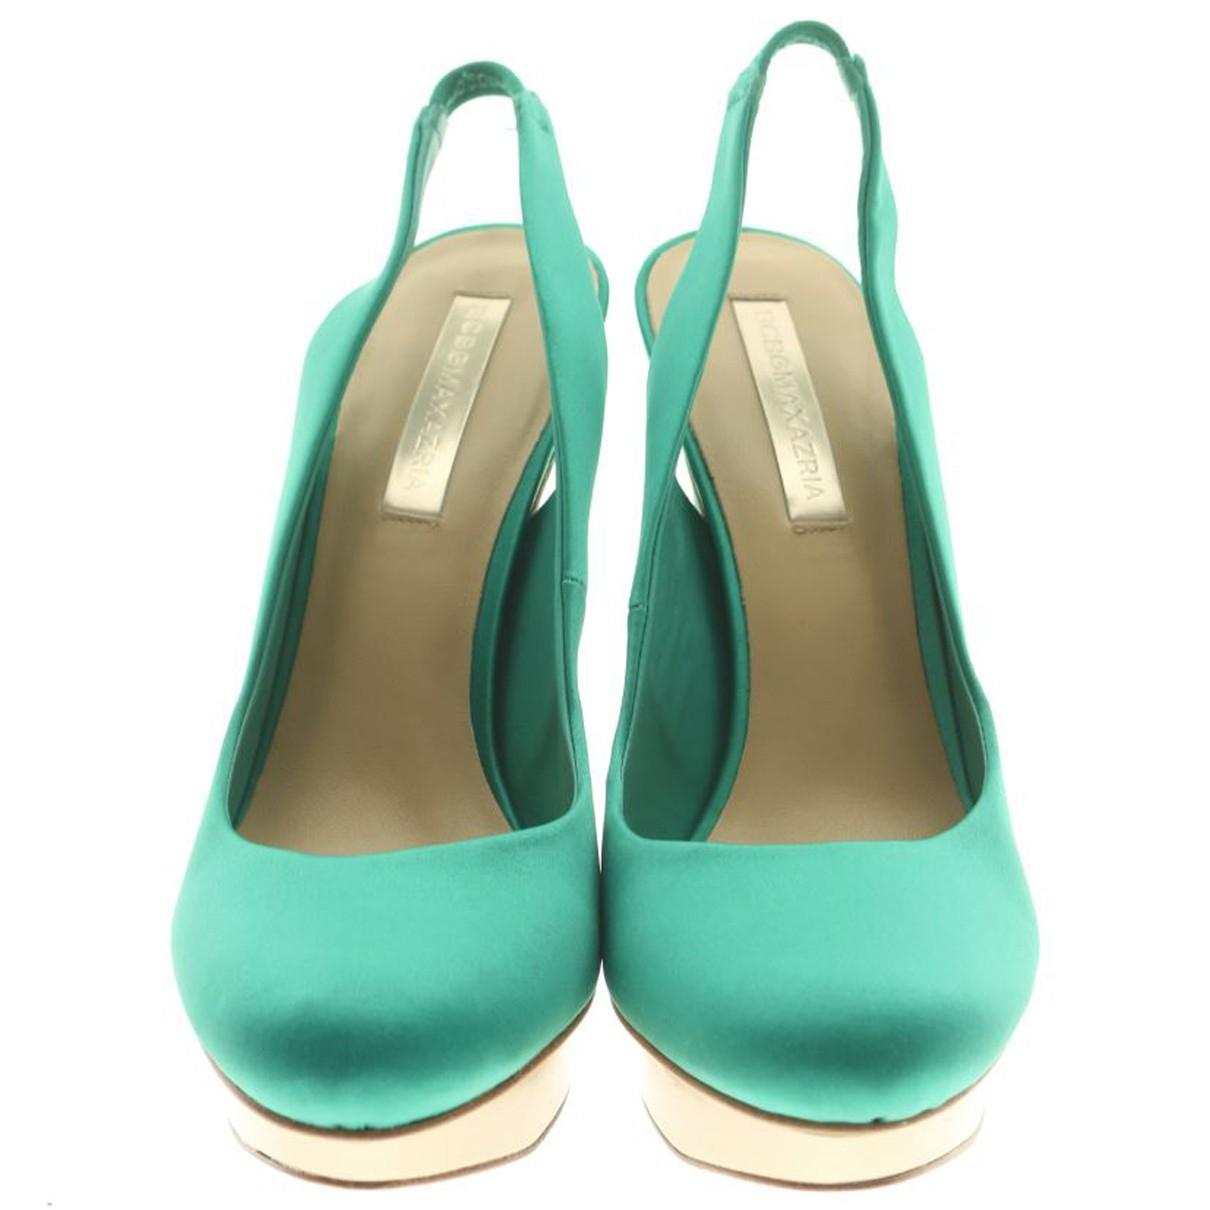 Bcbg Max Azria N Green Heels for Women 5 UK